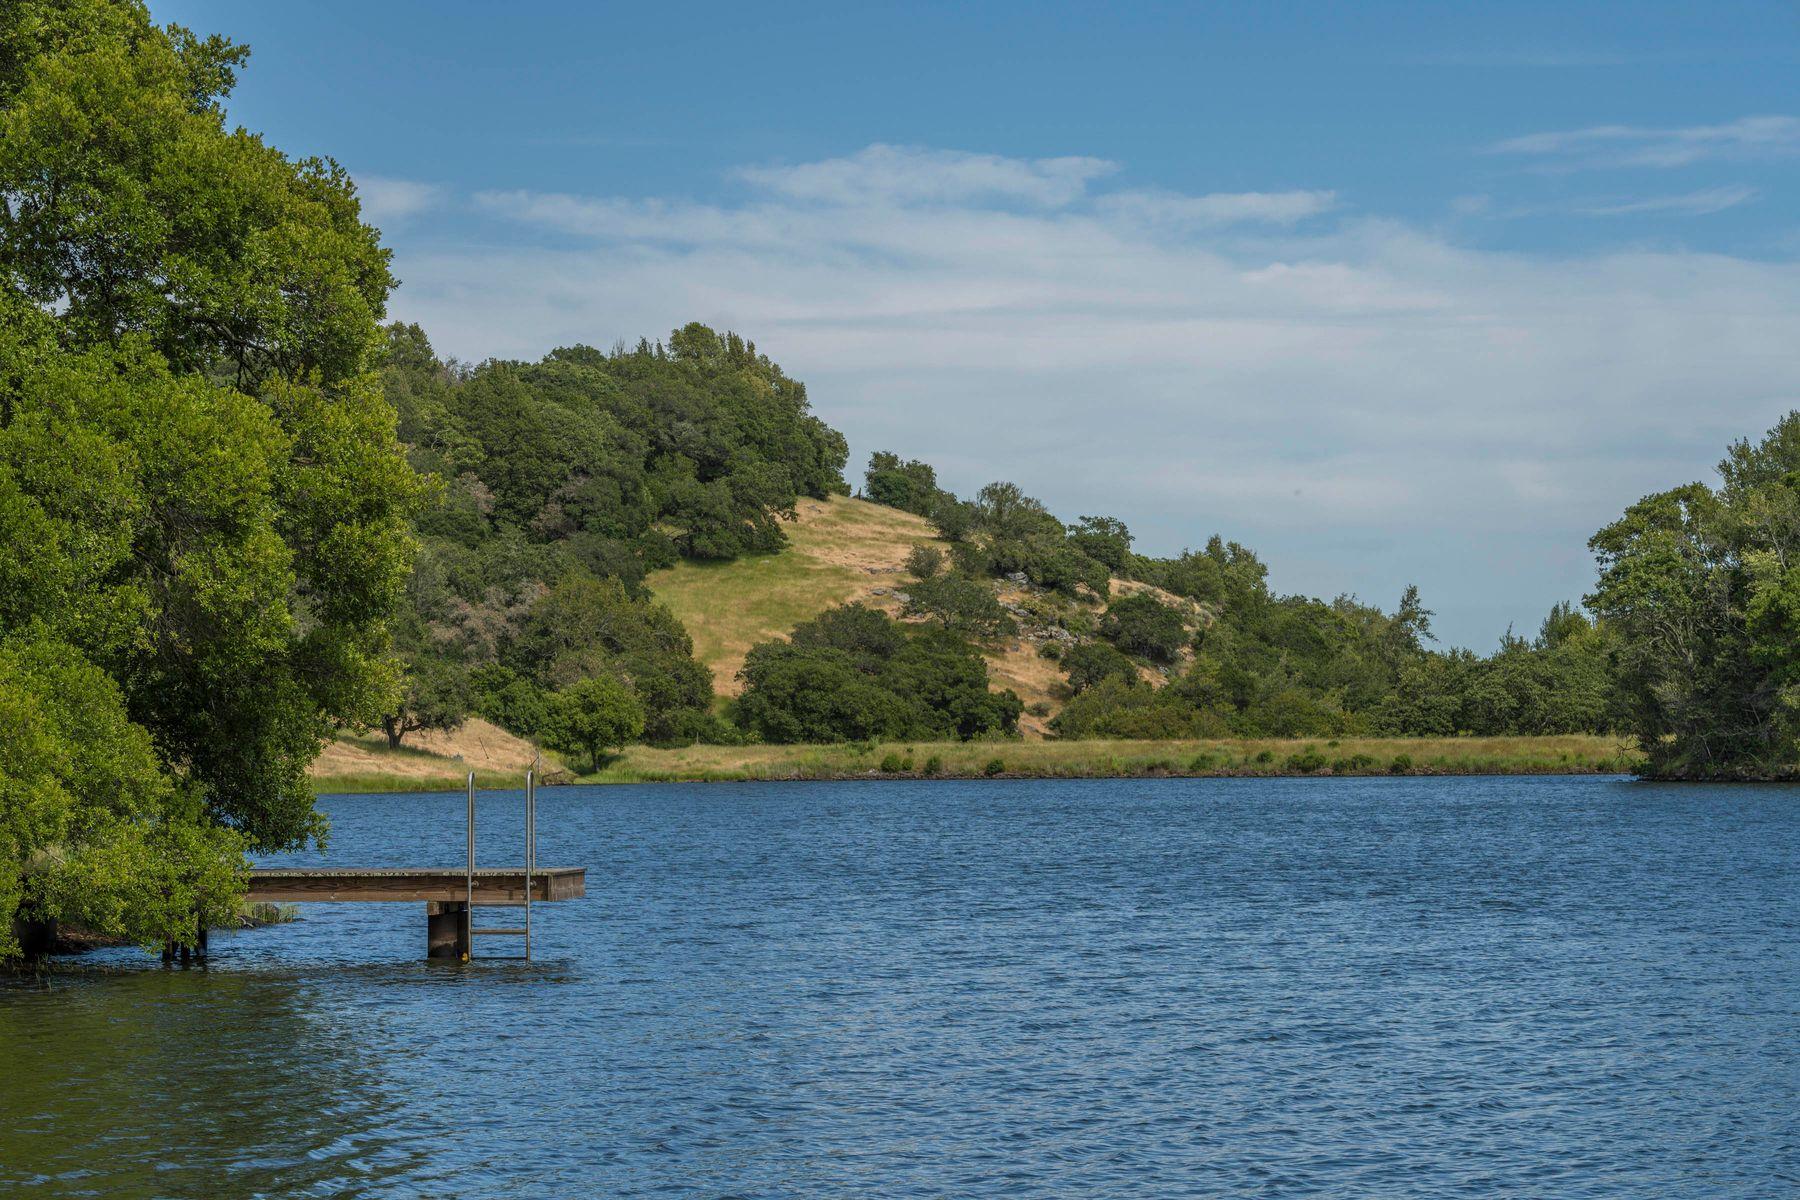 Vineyard Real Estate 为 销售 在 950 ac in Napa Valley Heaven on Earth 1681 Green Valley Rd 纳帕, 加利福尼亚州 94558 美国